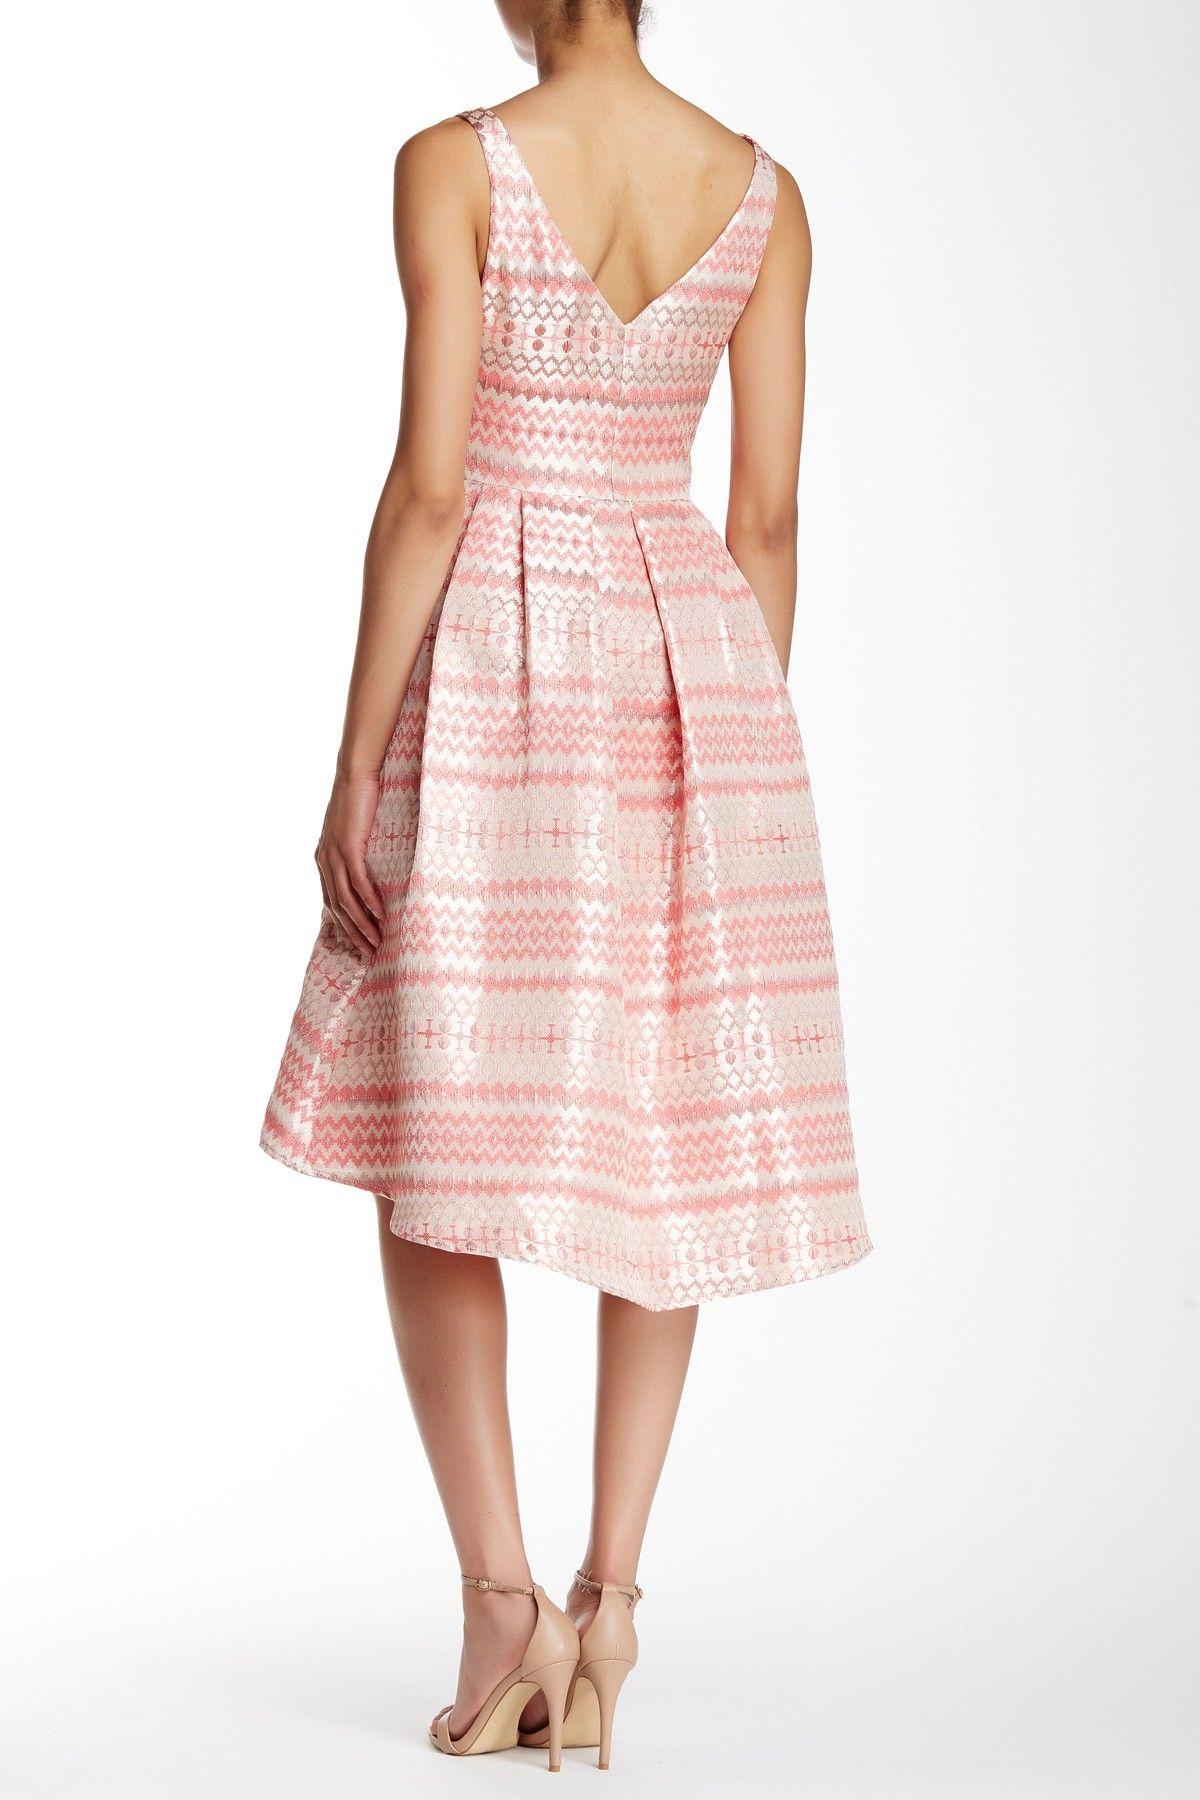 Zander Dress